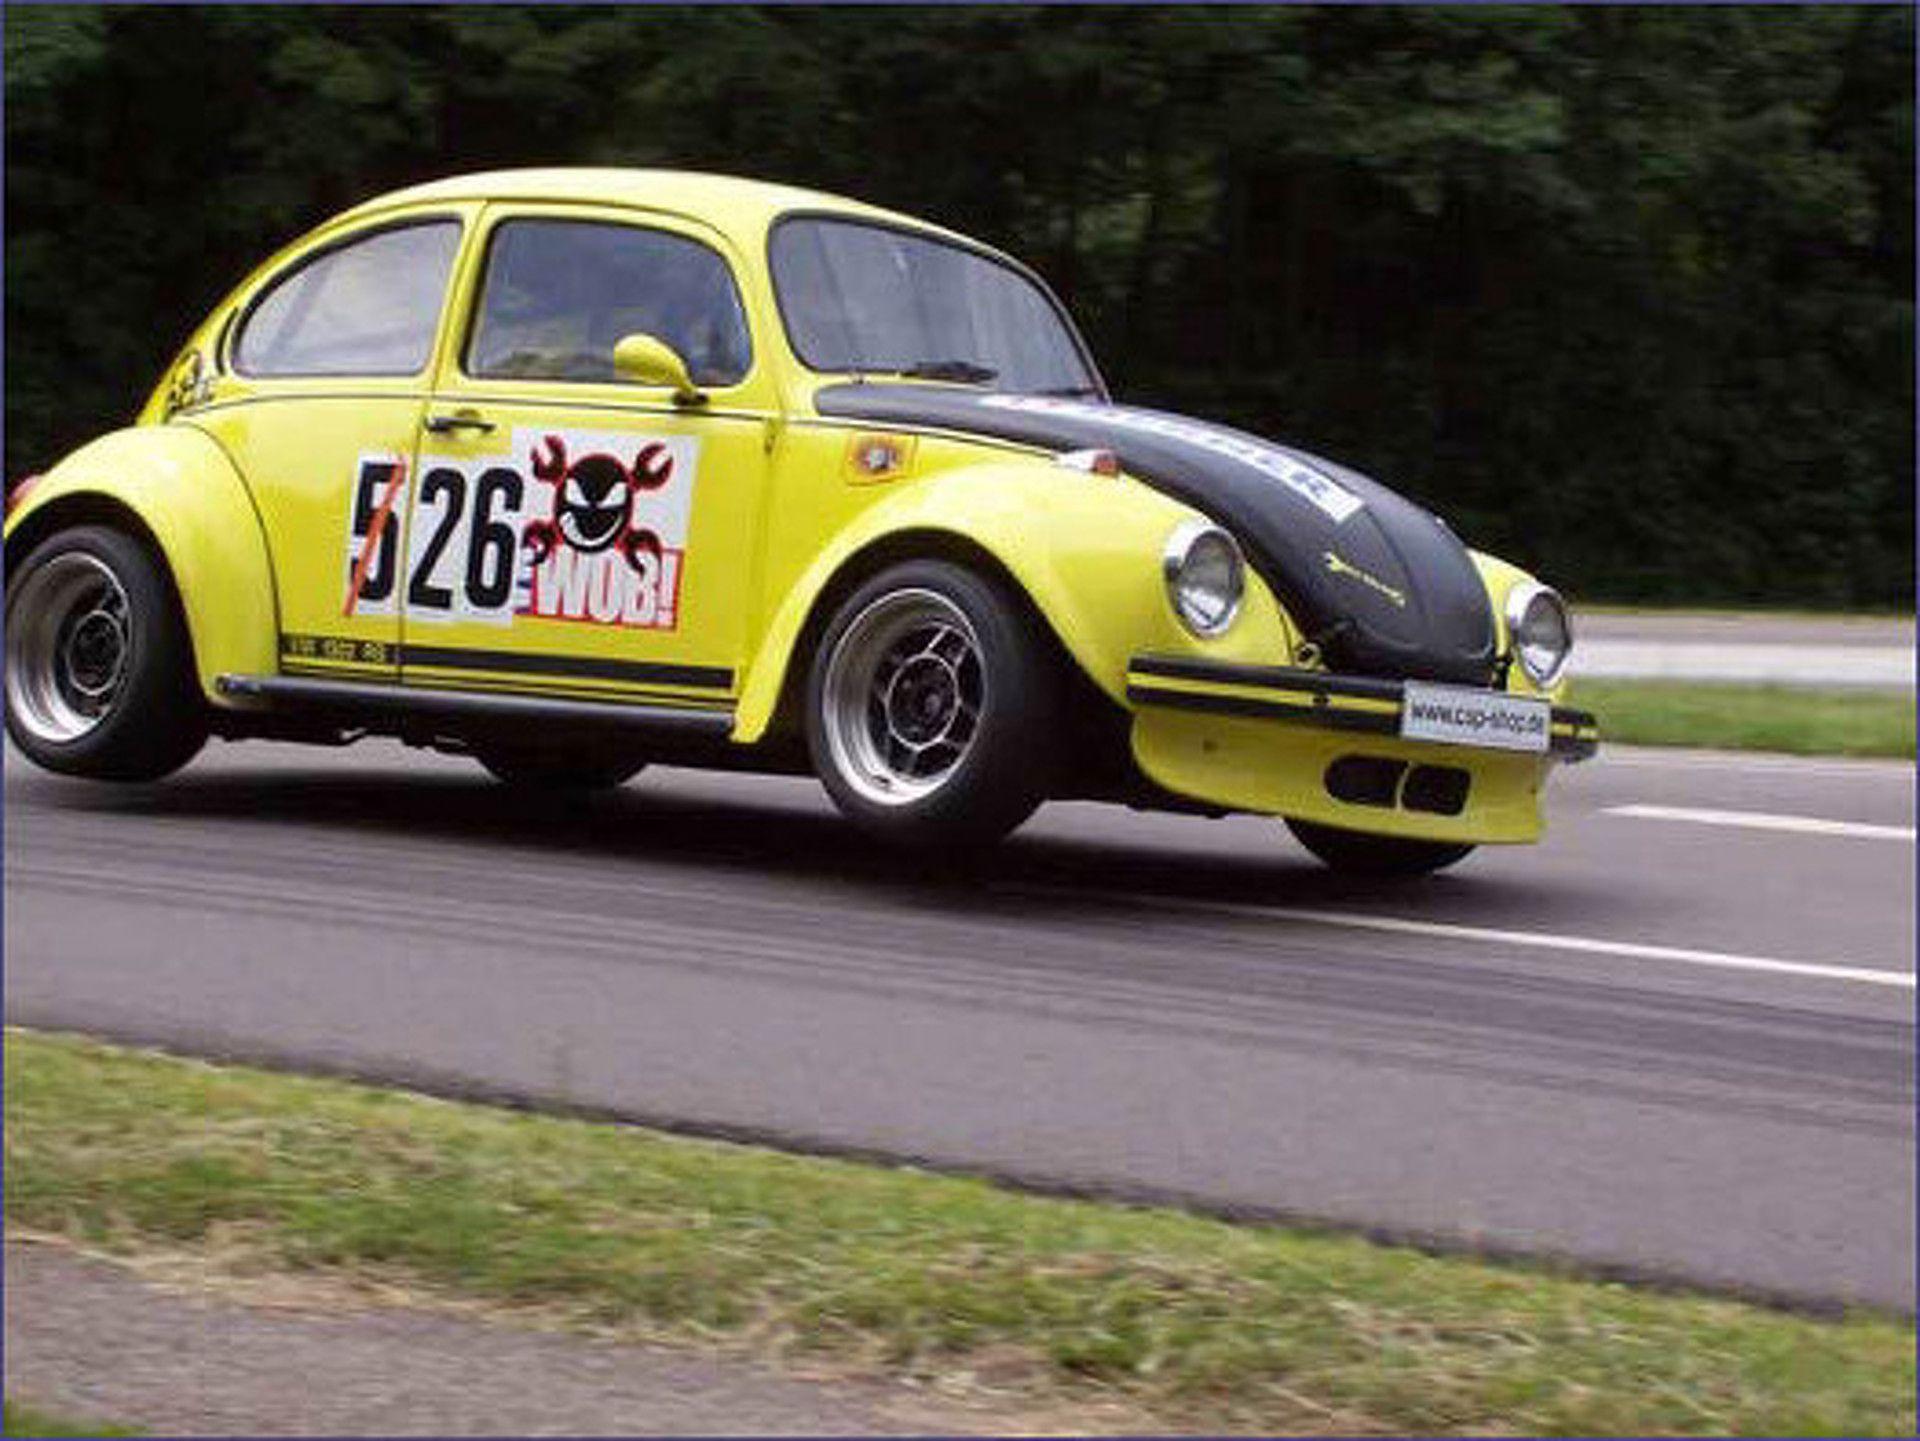 Super Super Beetle A K A The German Look Vw Super Beetle Vw Beetle Classic Vw Racing